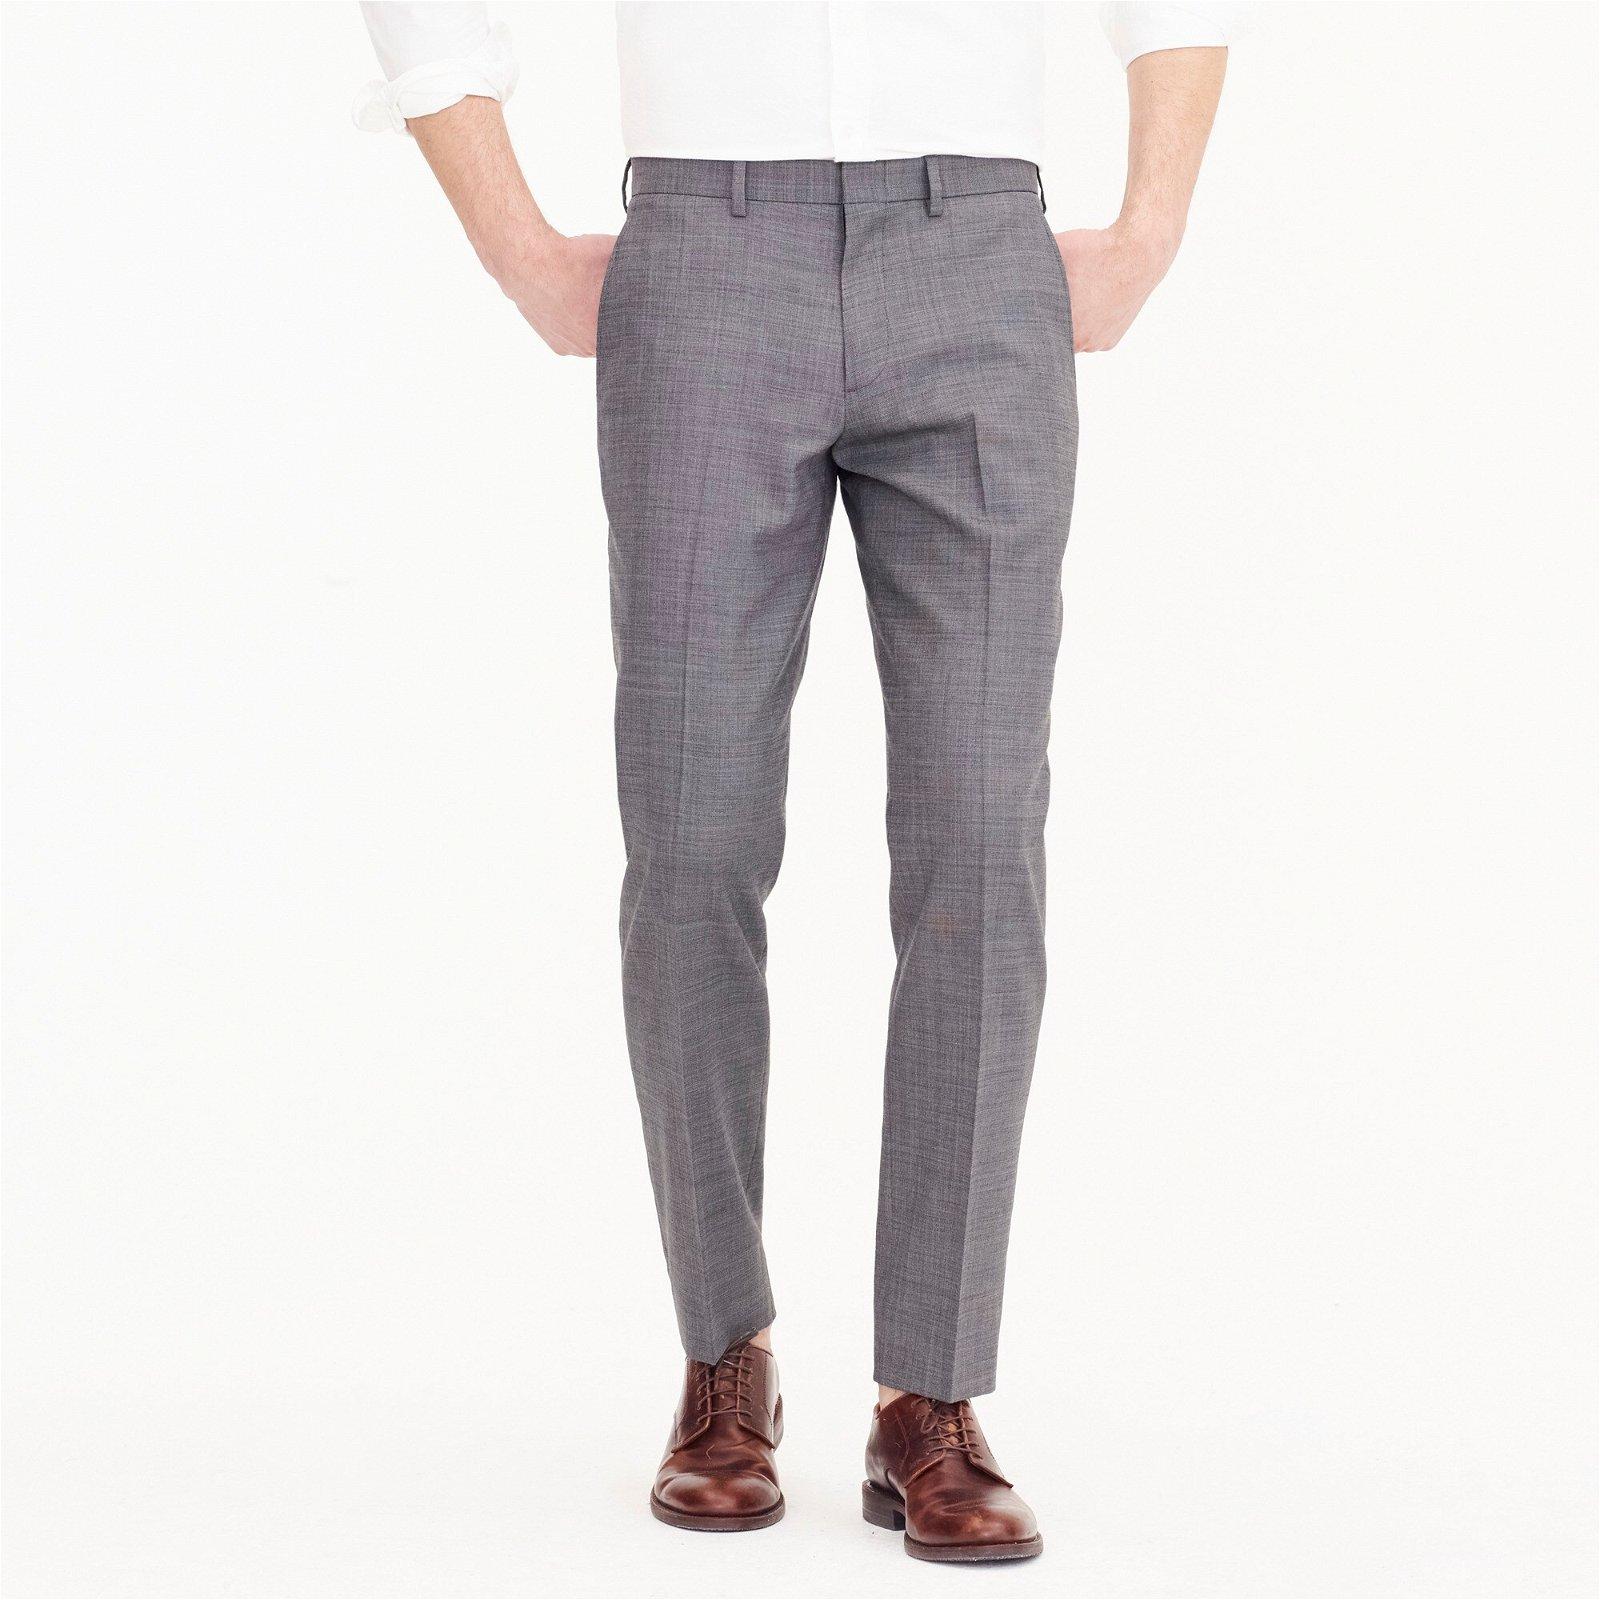 Ludlow Slim-fit stretch dress pant in four-season wool